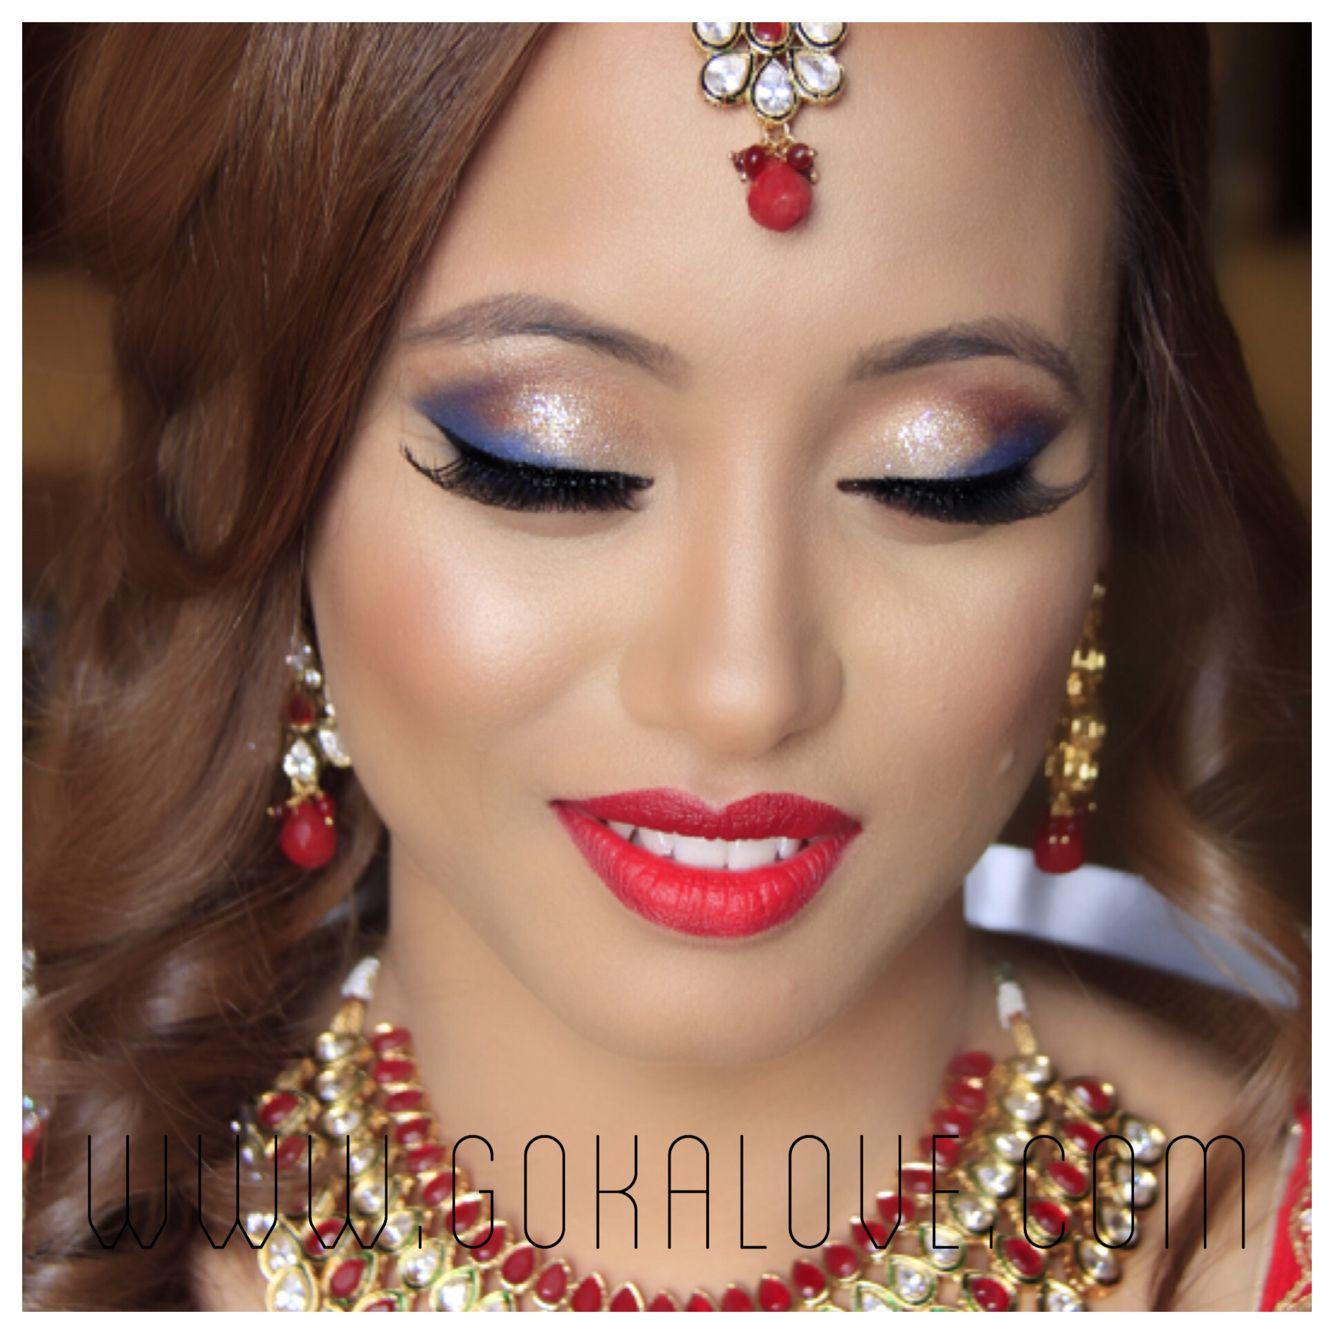 Makeup And Hair Boston Indian Wedding Nepali Machusetts Artist